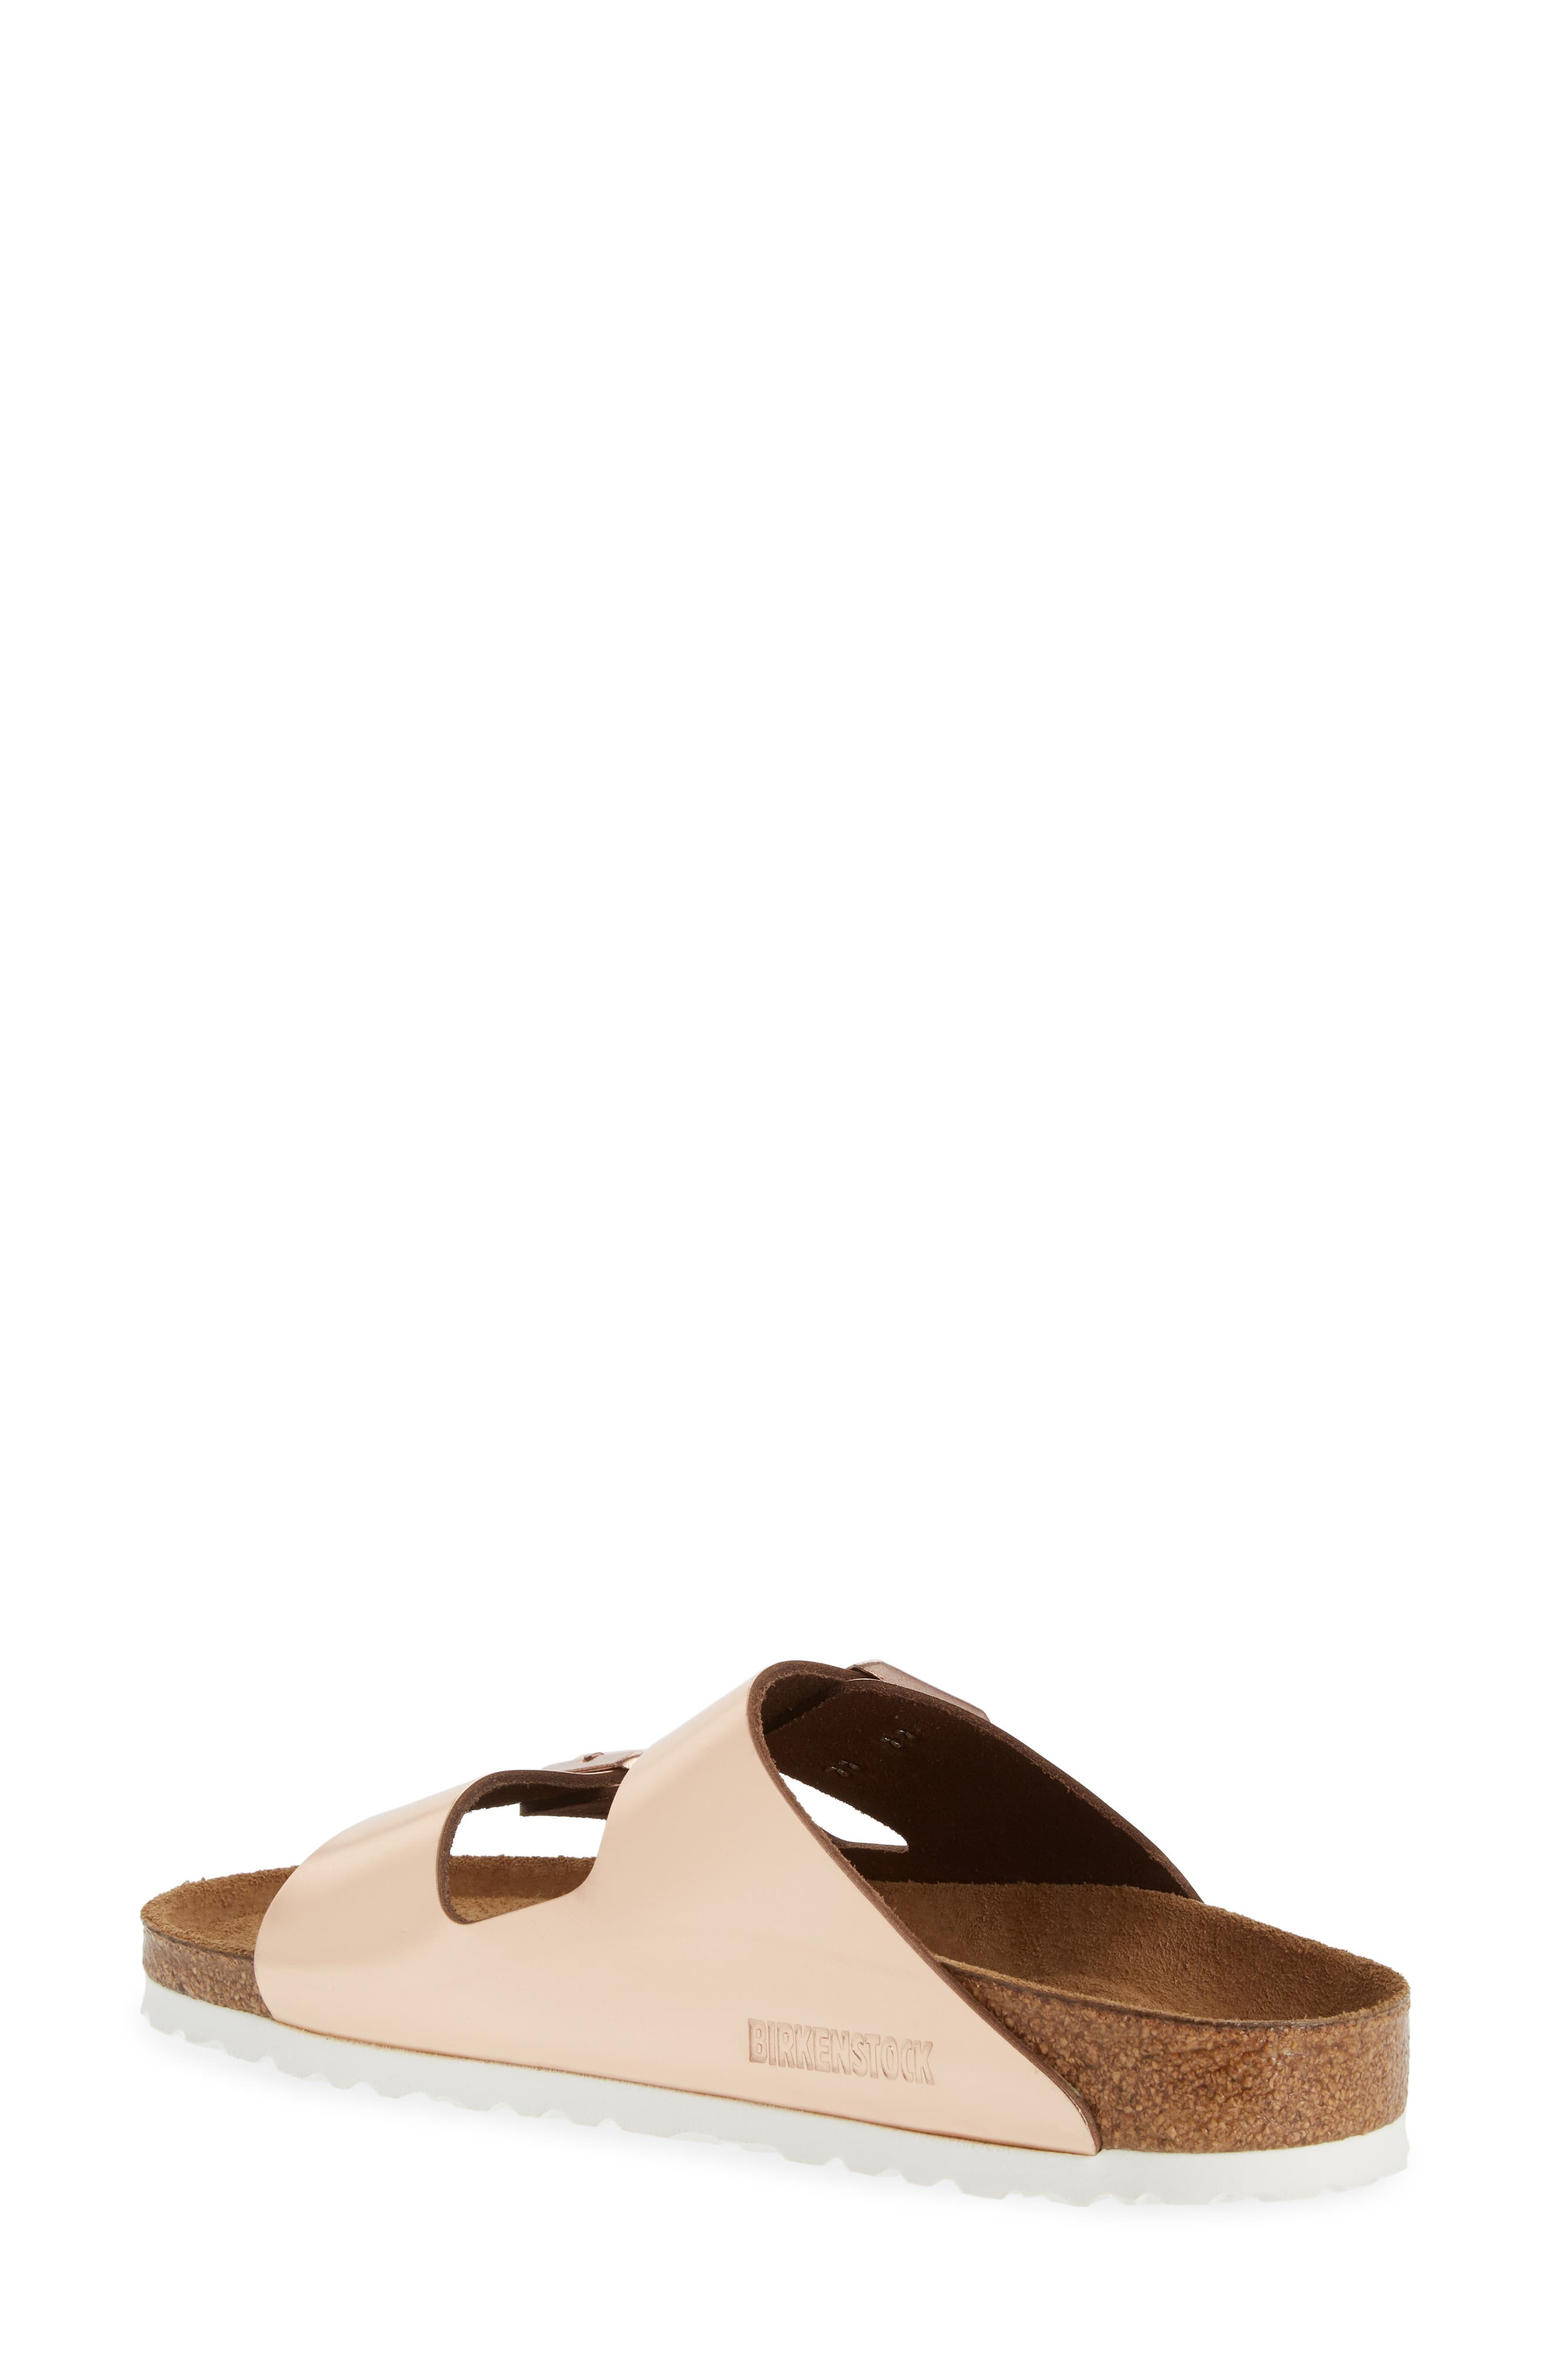 Arizona Soft Footbed Sandal,                             Alternate thumbnail 2, color,                             COPPER LEATHER